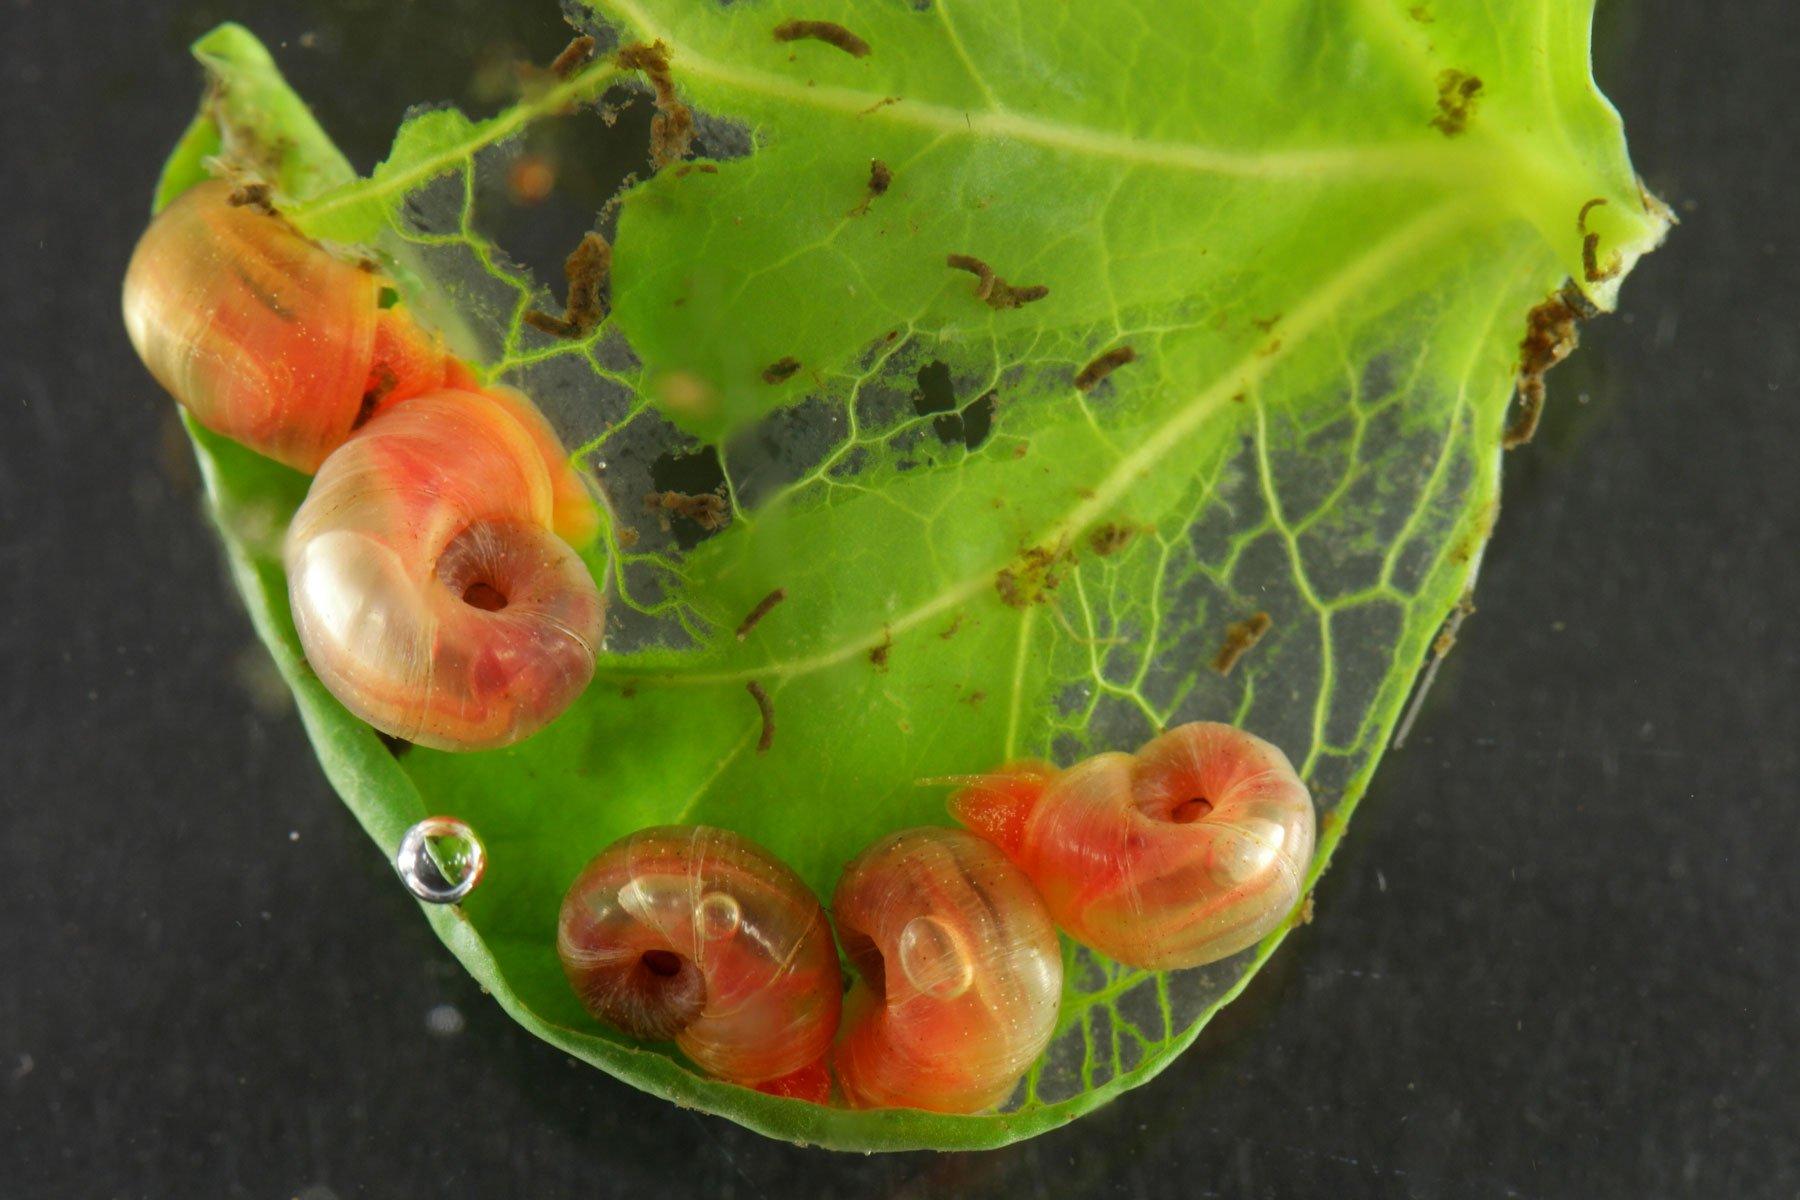 Posthornschnecken fressen Kaffeeblatt